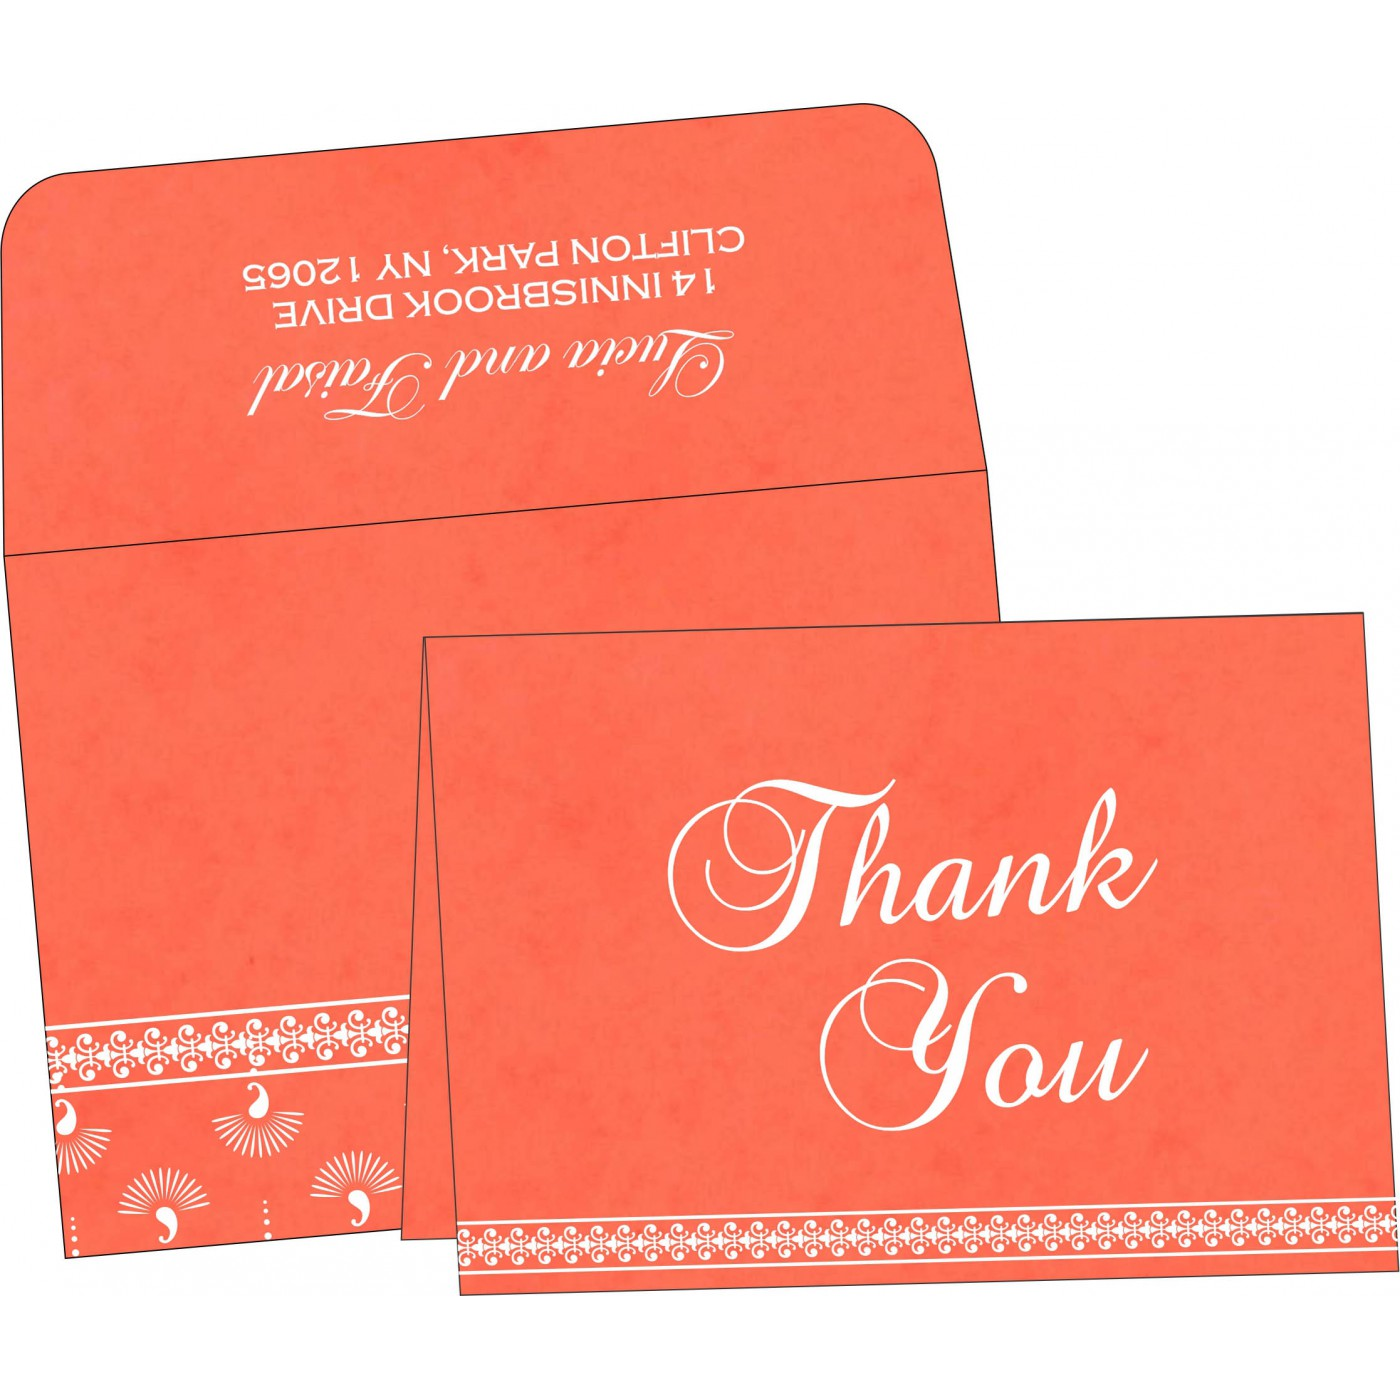 Thank You Cards : TYC-8247I - 123WeddingCards